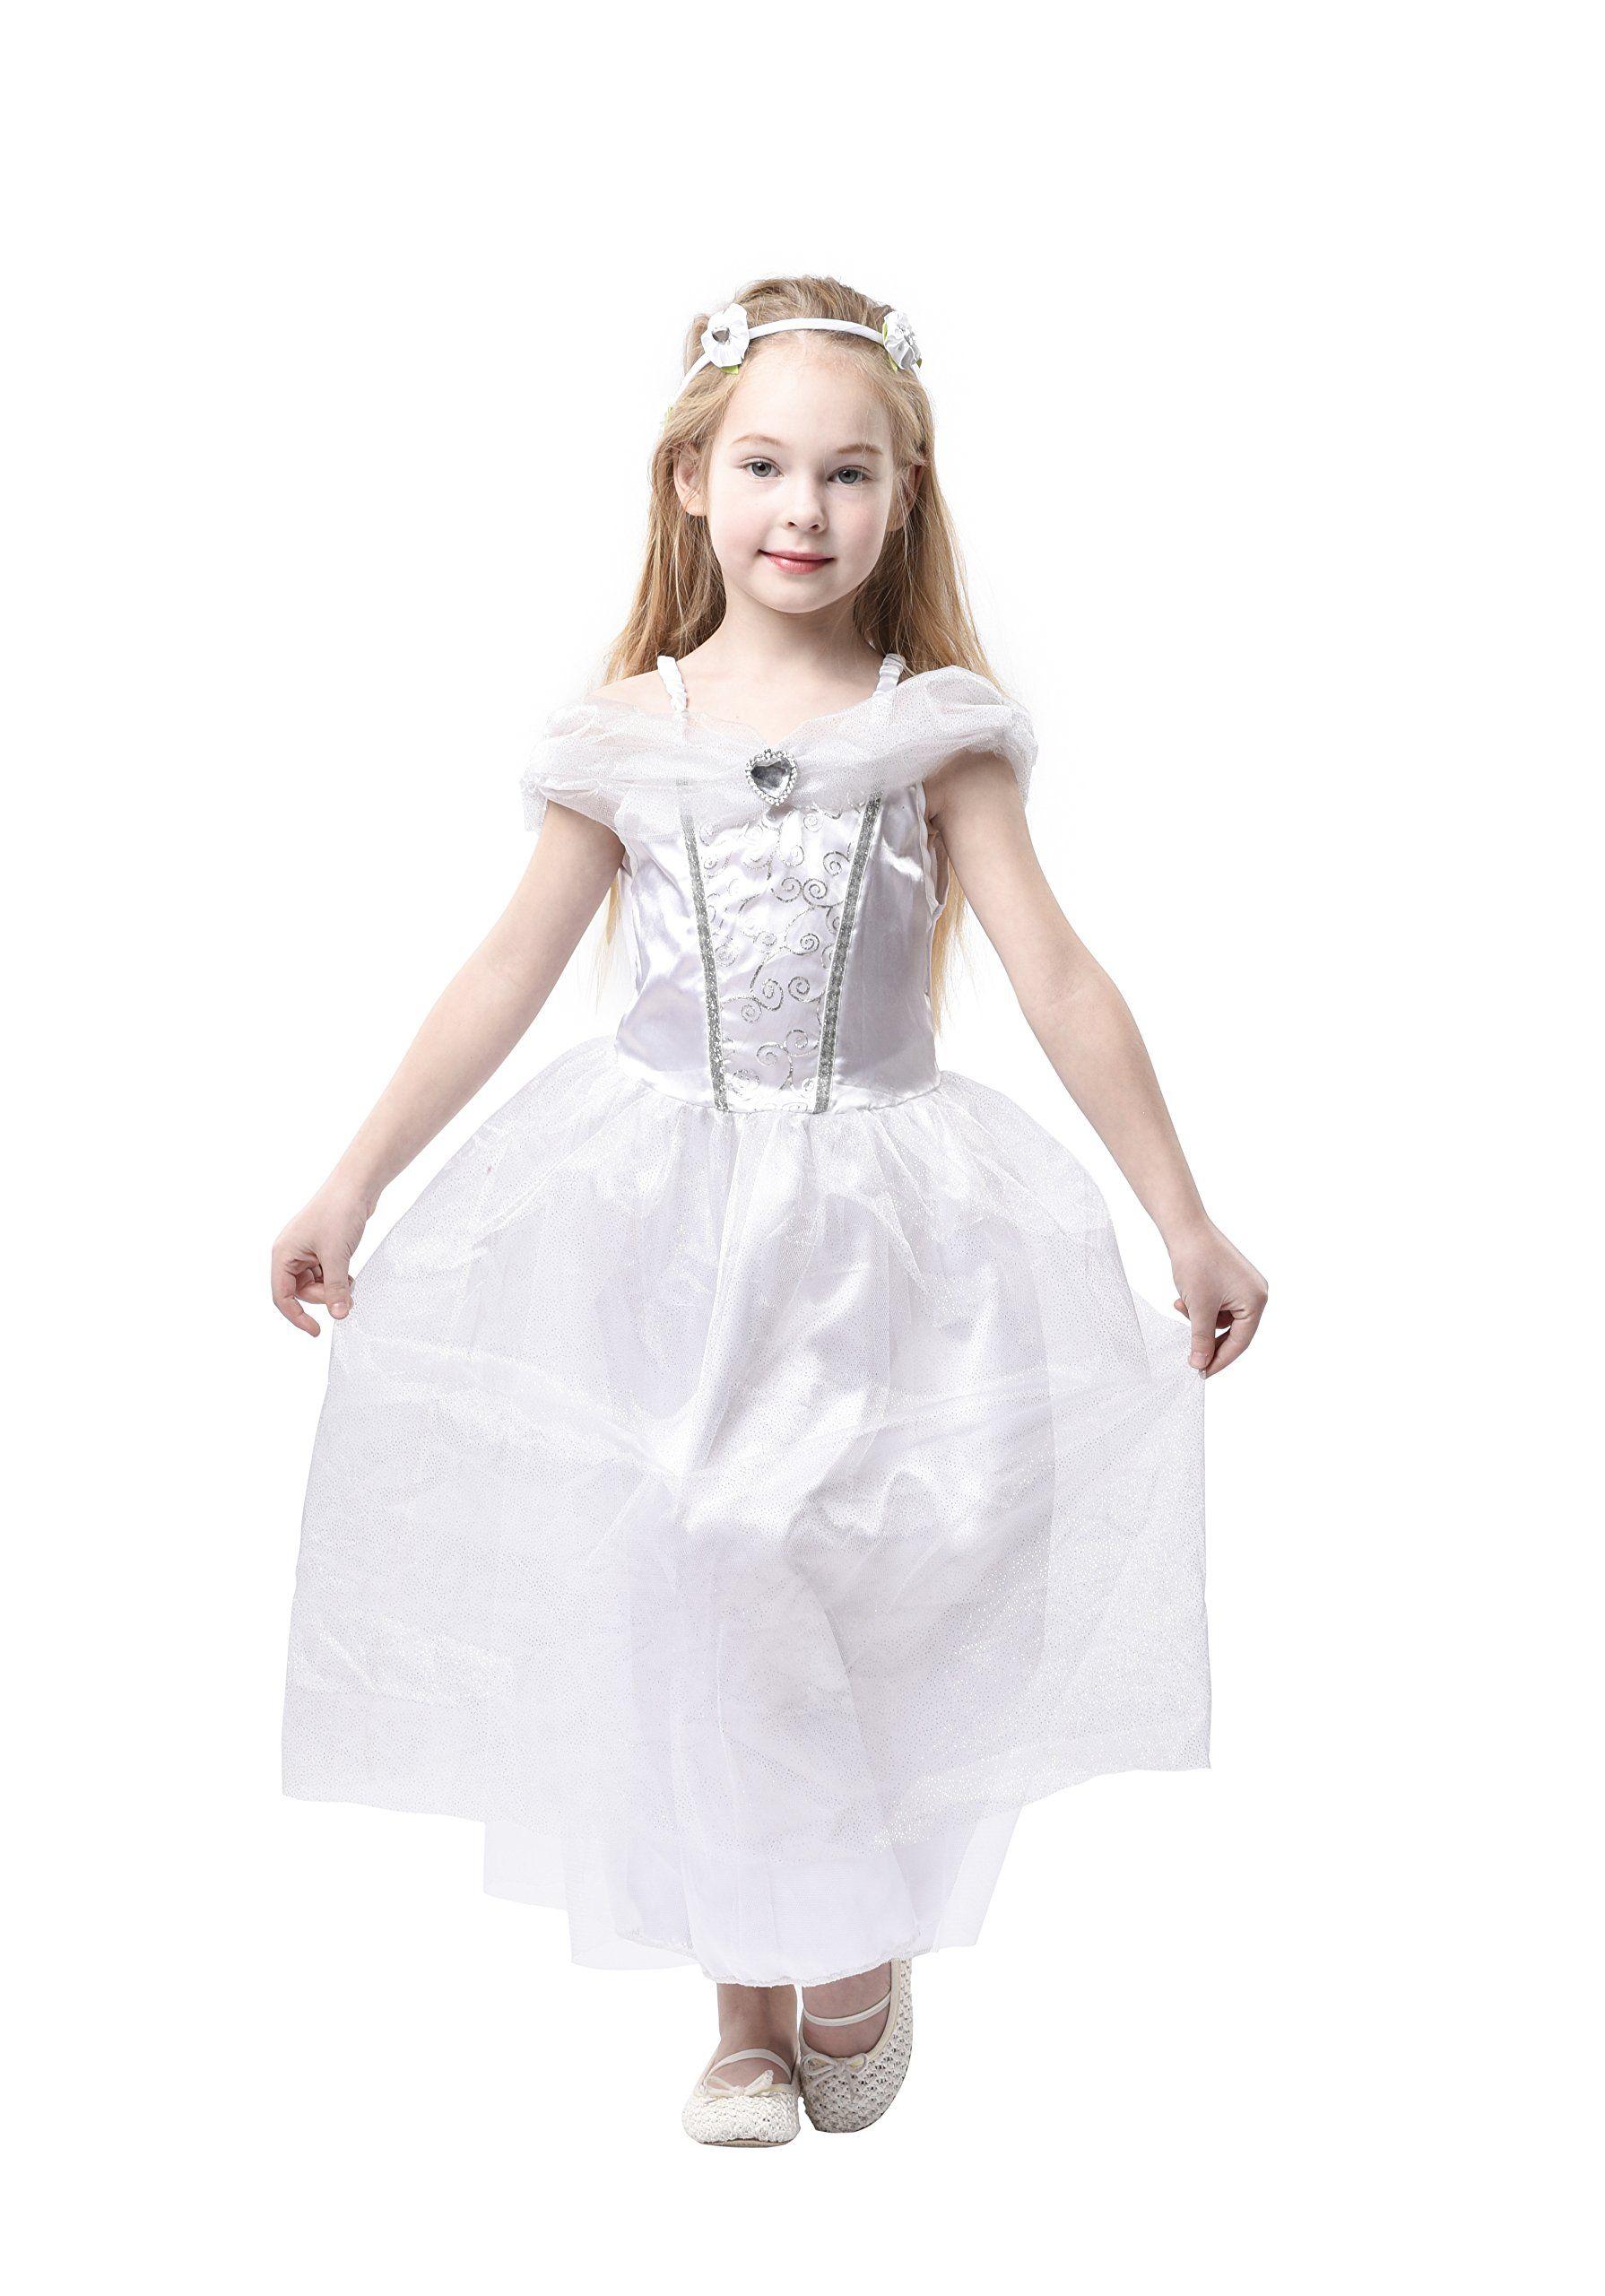 Blue panda wedding dress kids bride costume bridal gown